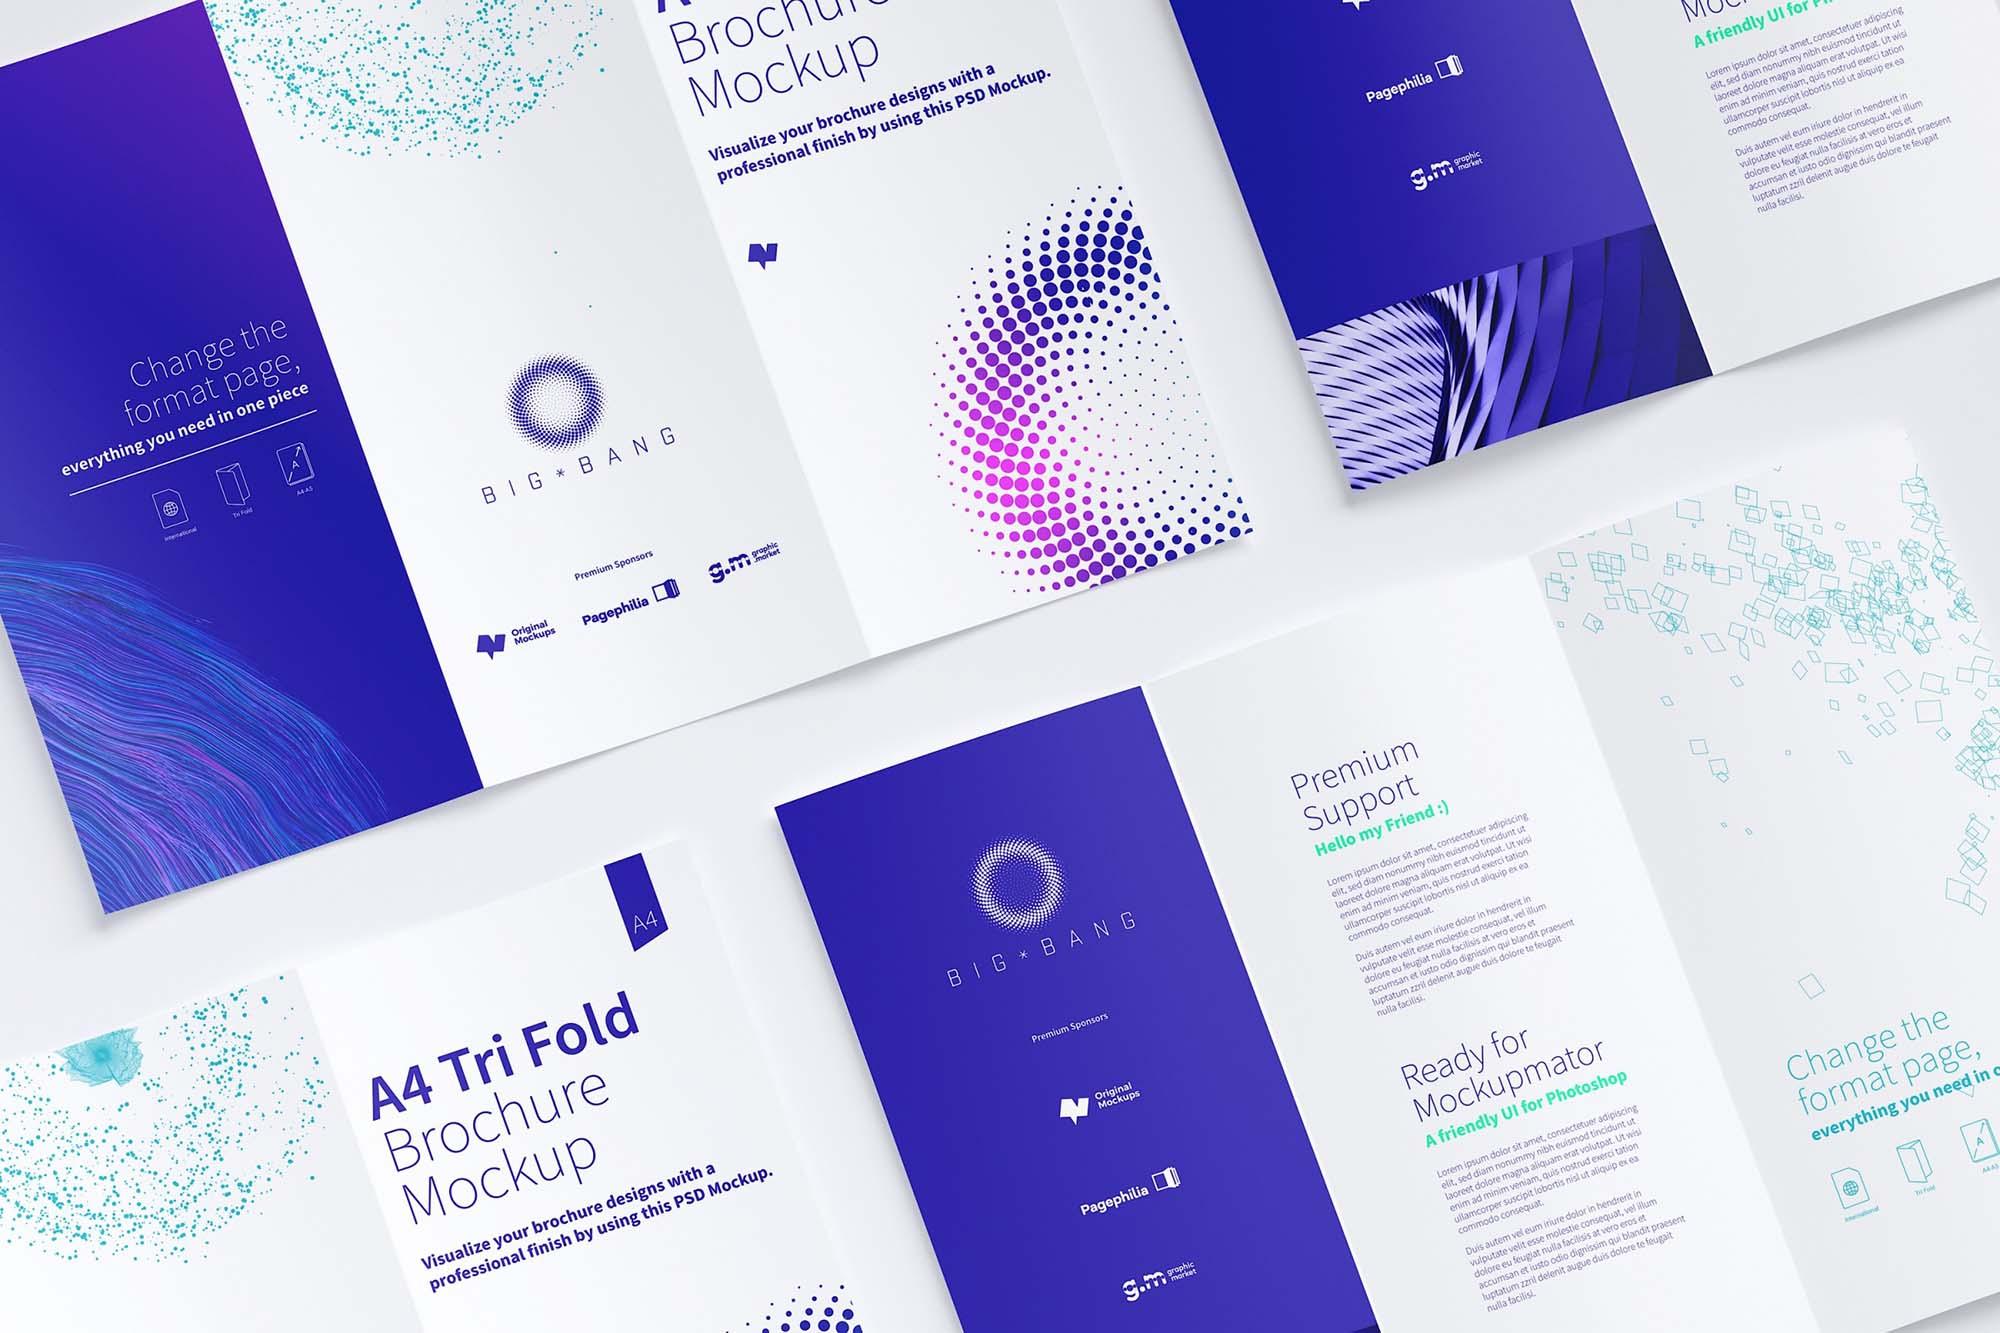 Trifold A4 Brochure Mockup 2